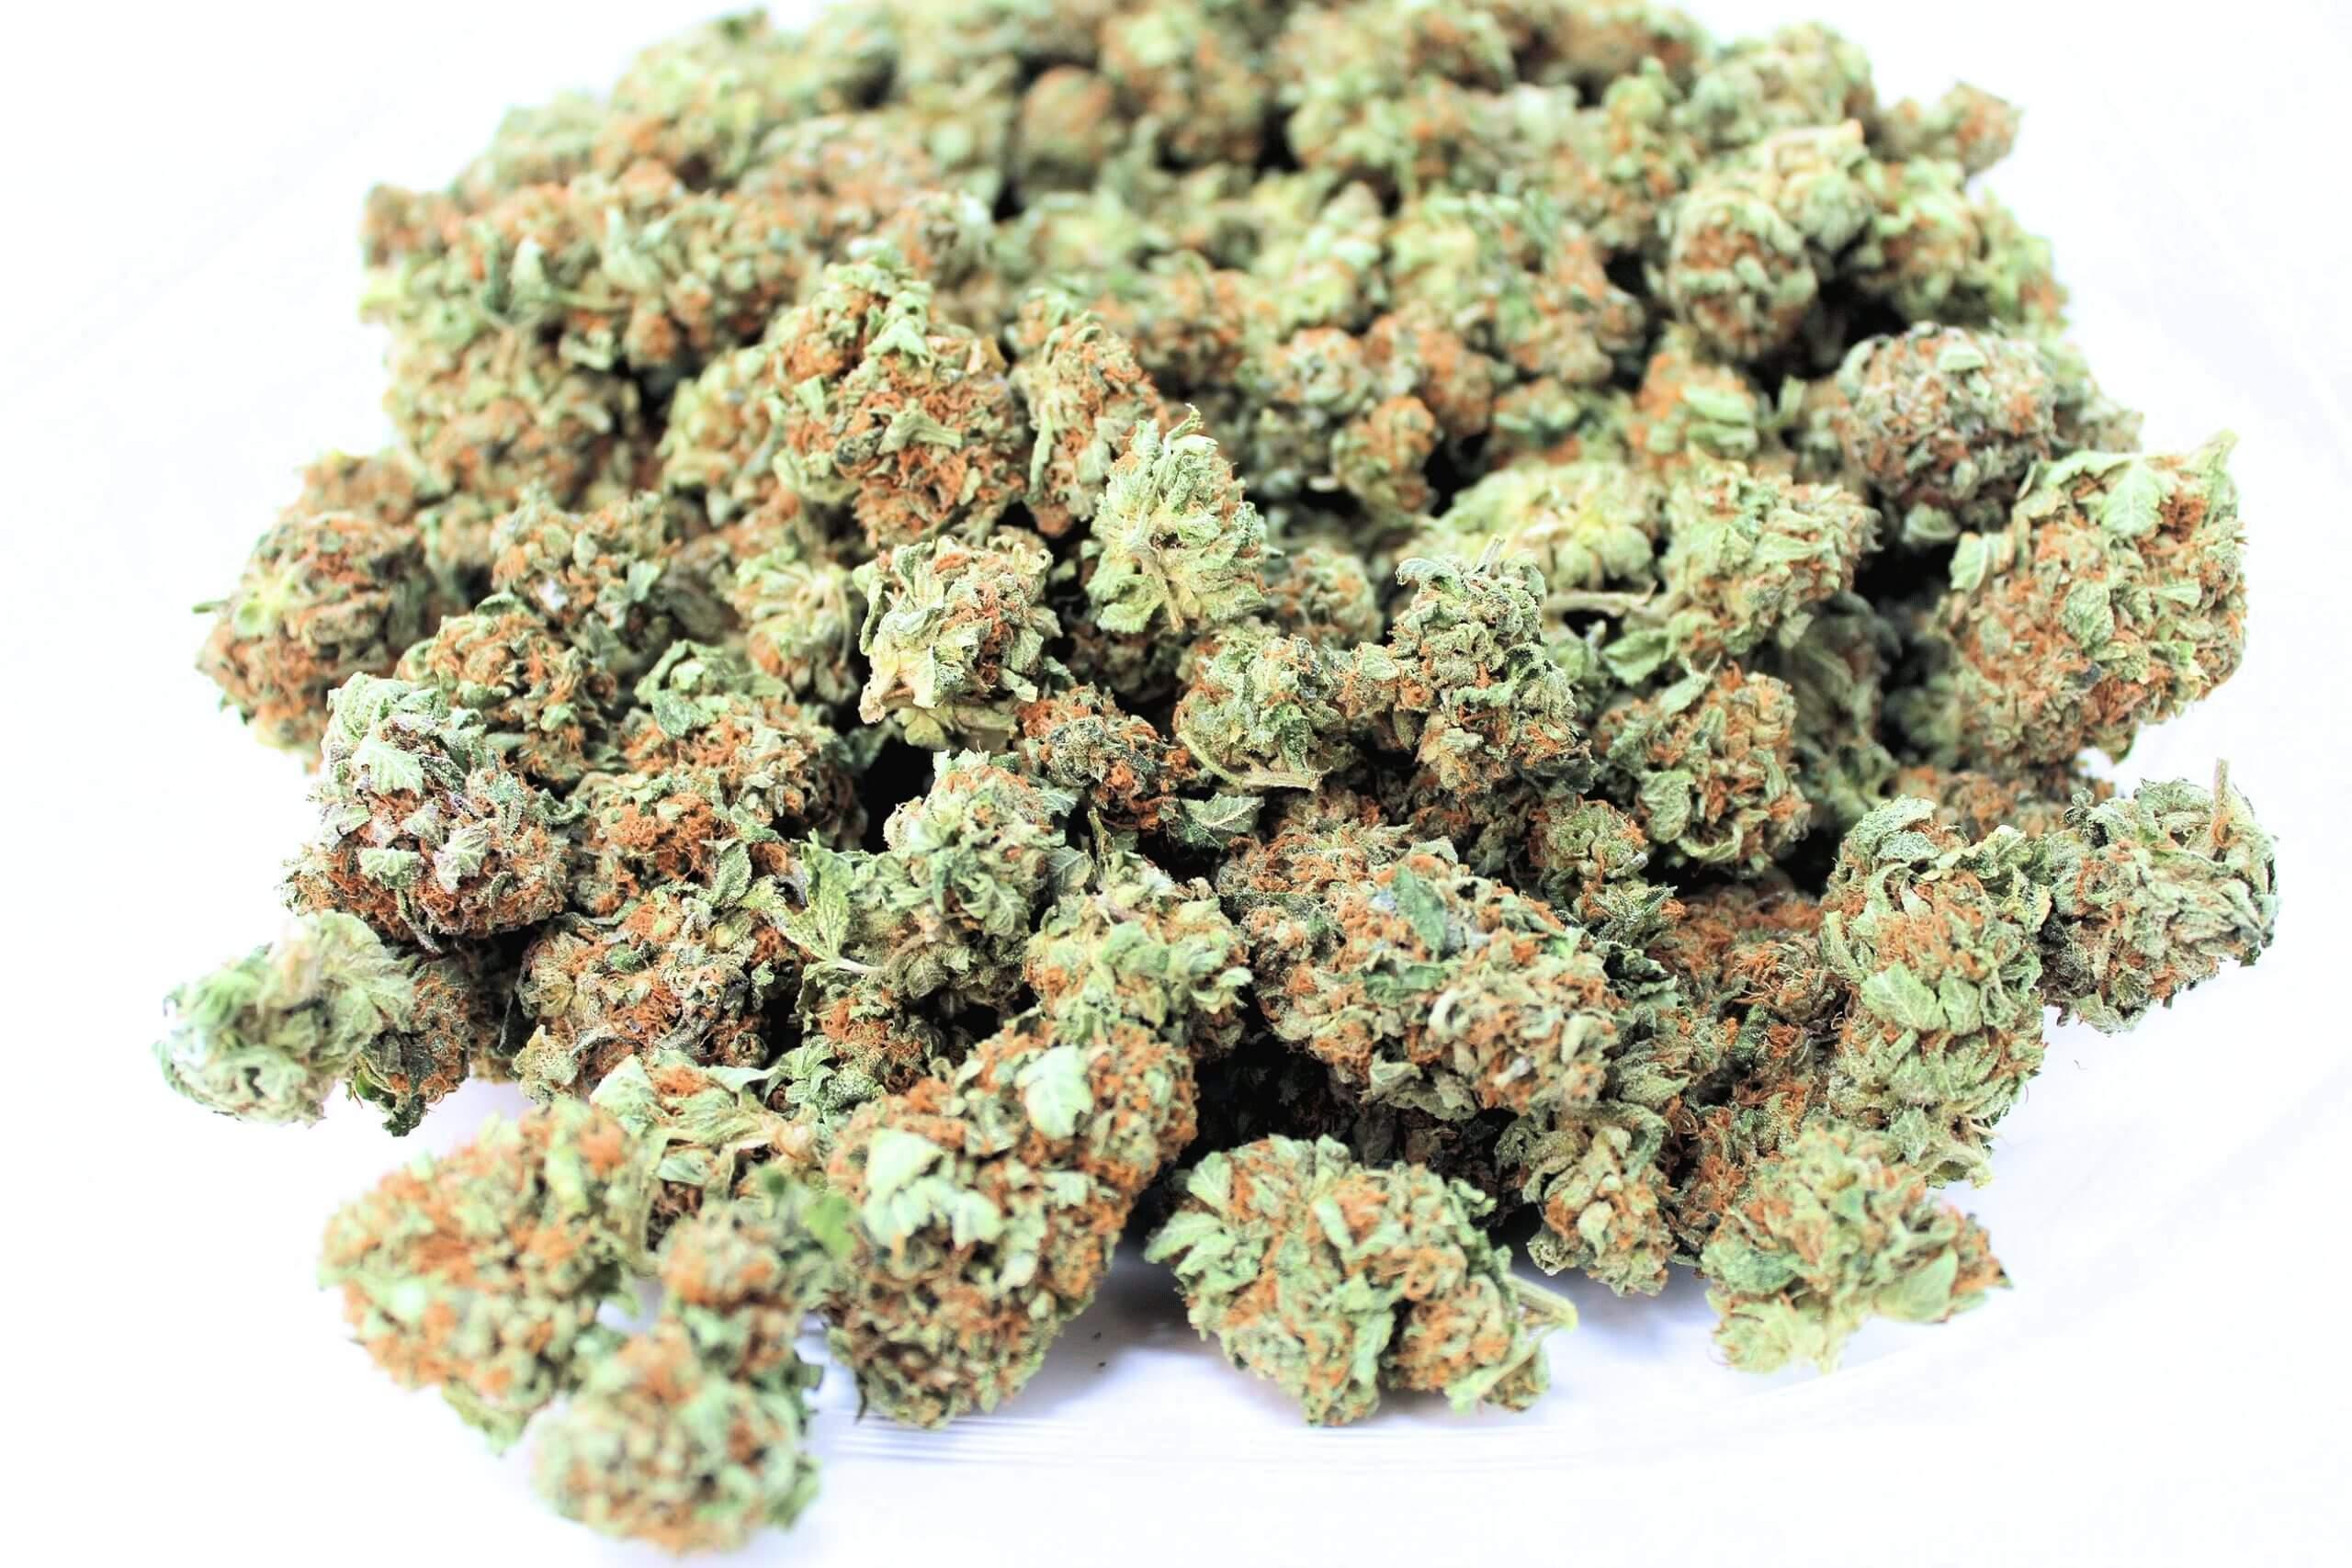 pink bubba weed